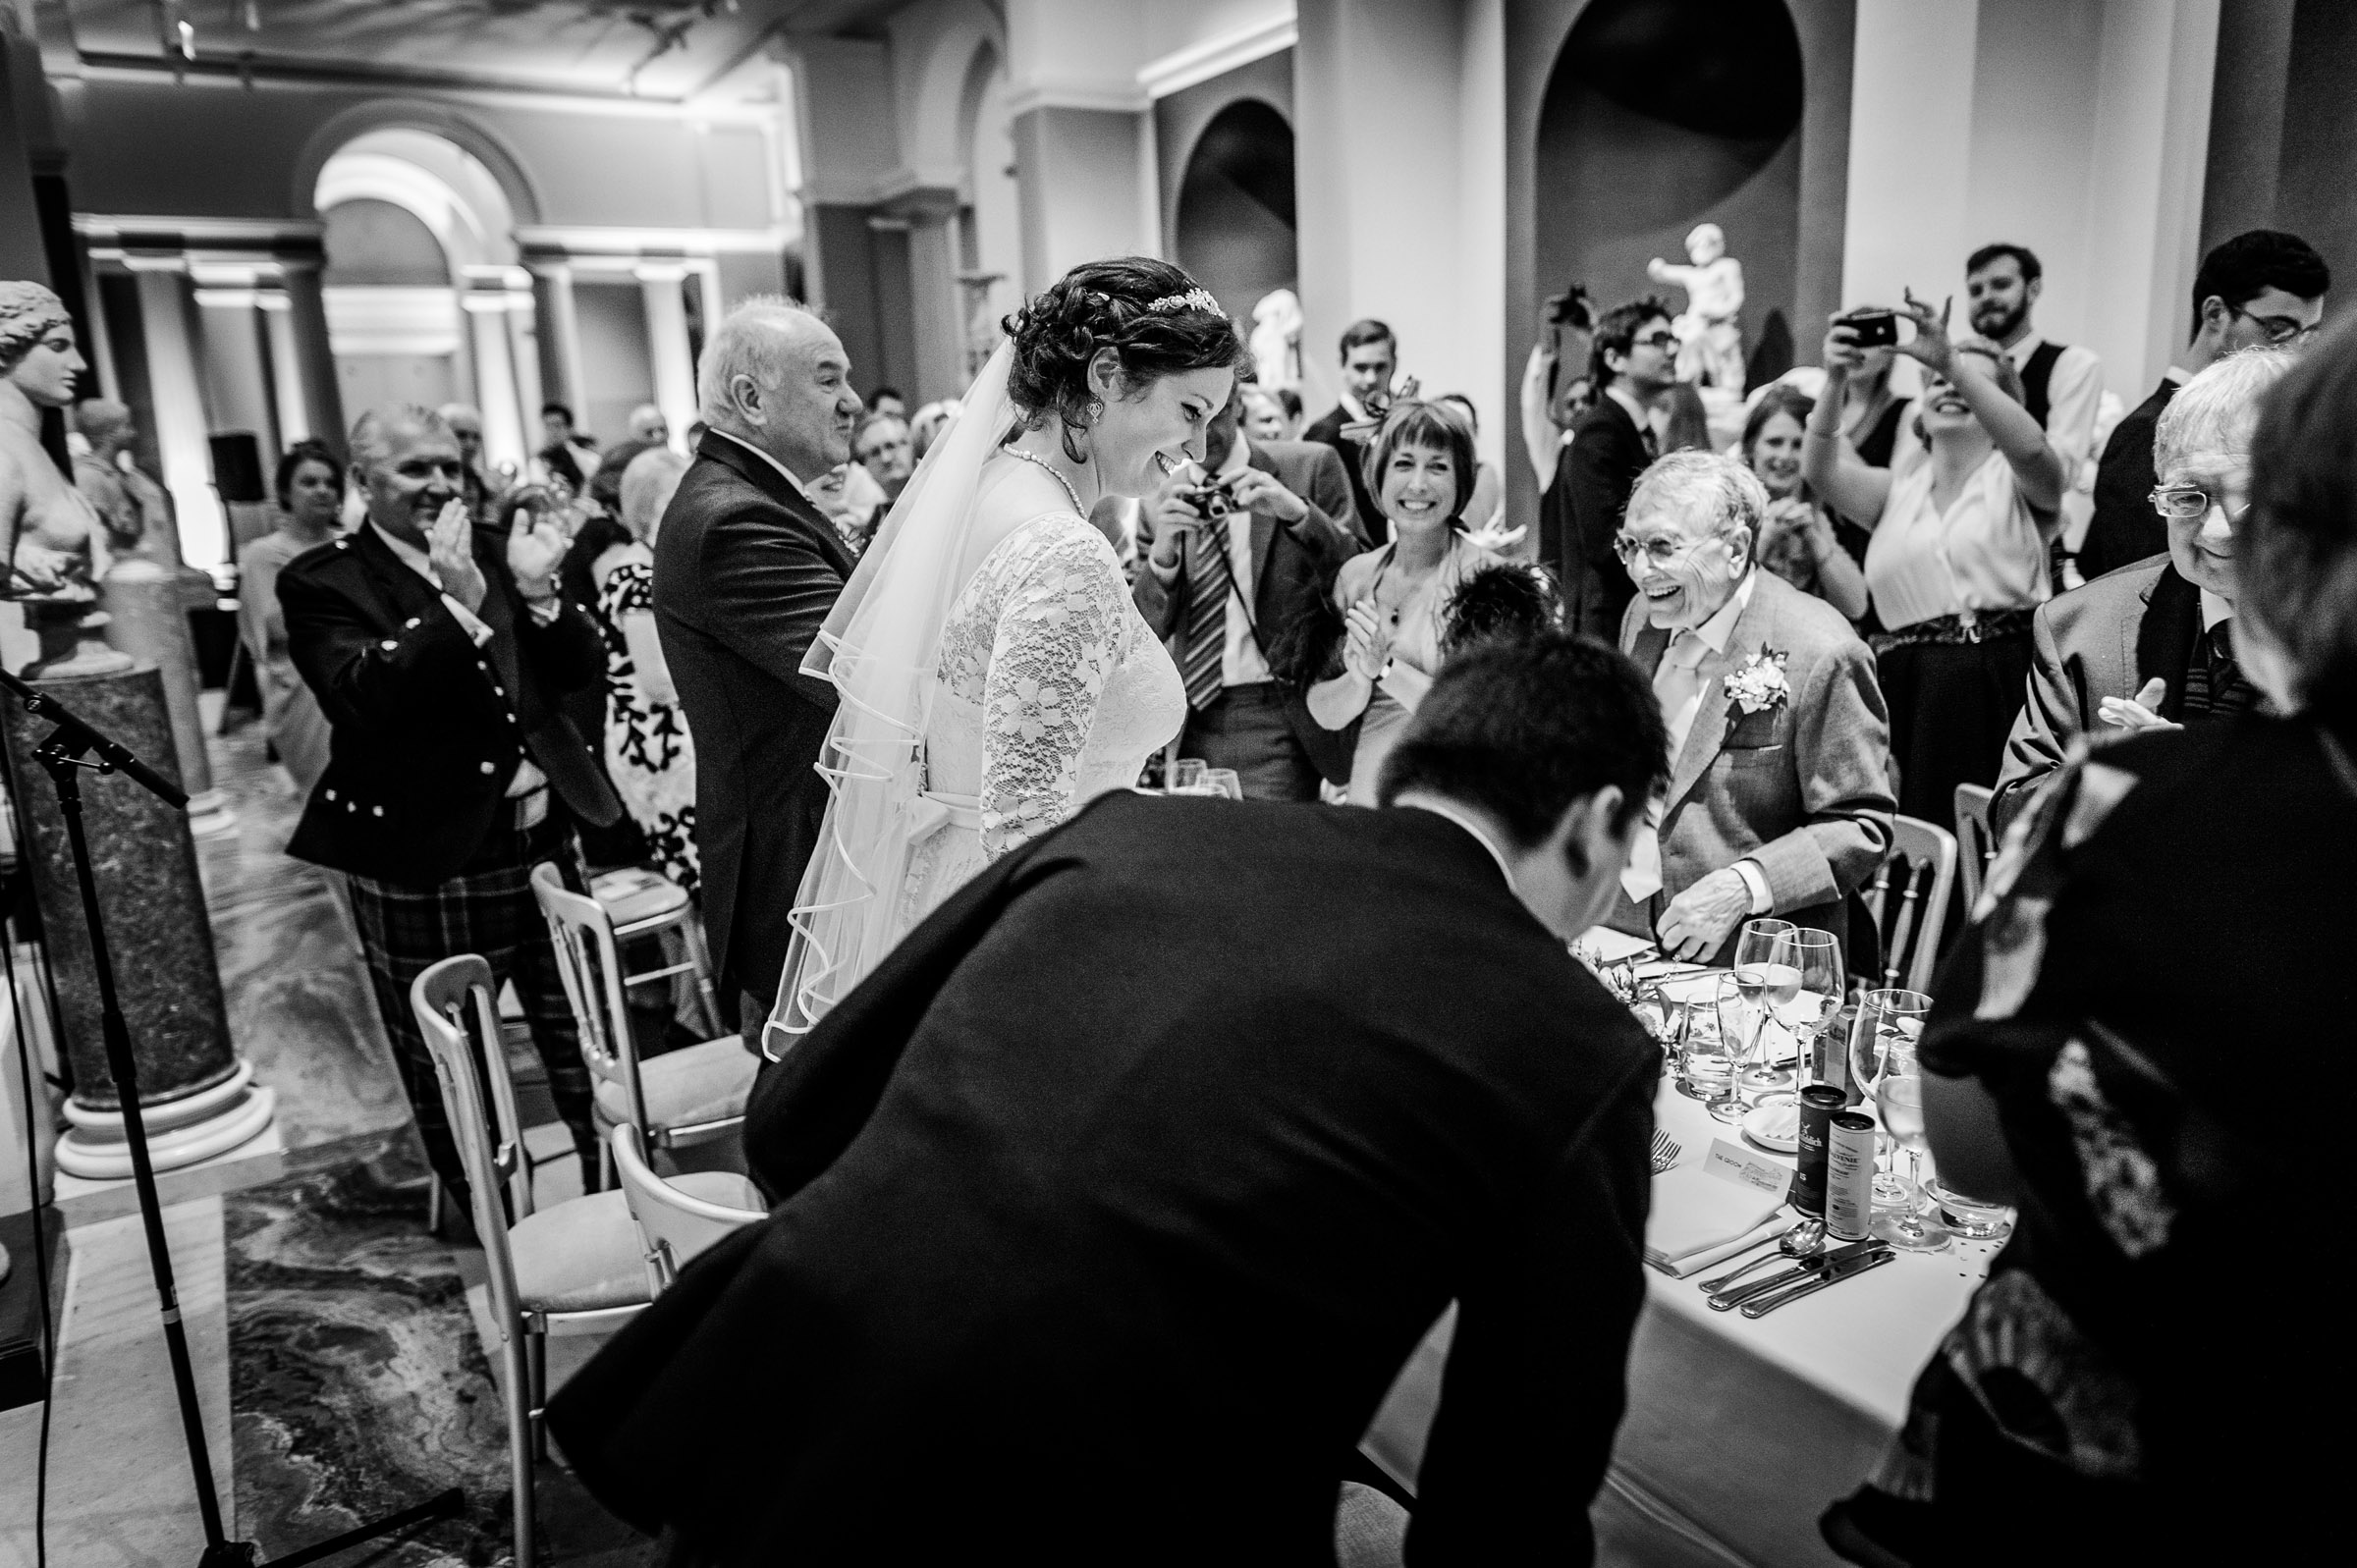 Ashmolean-Museum-Wedding-Pictures-0049.jpg